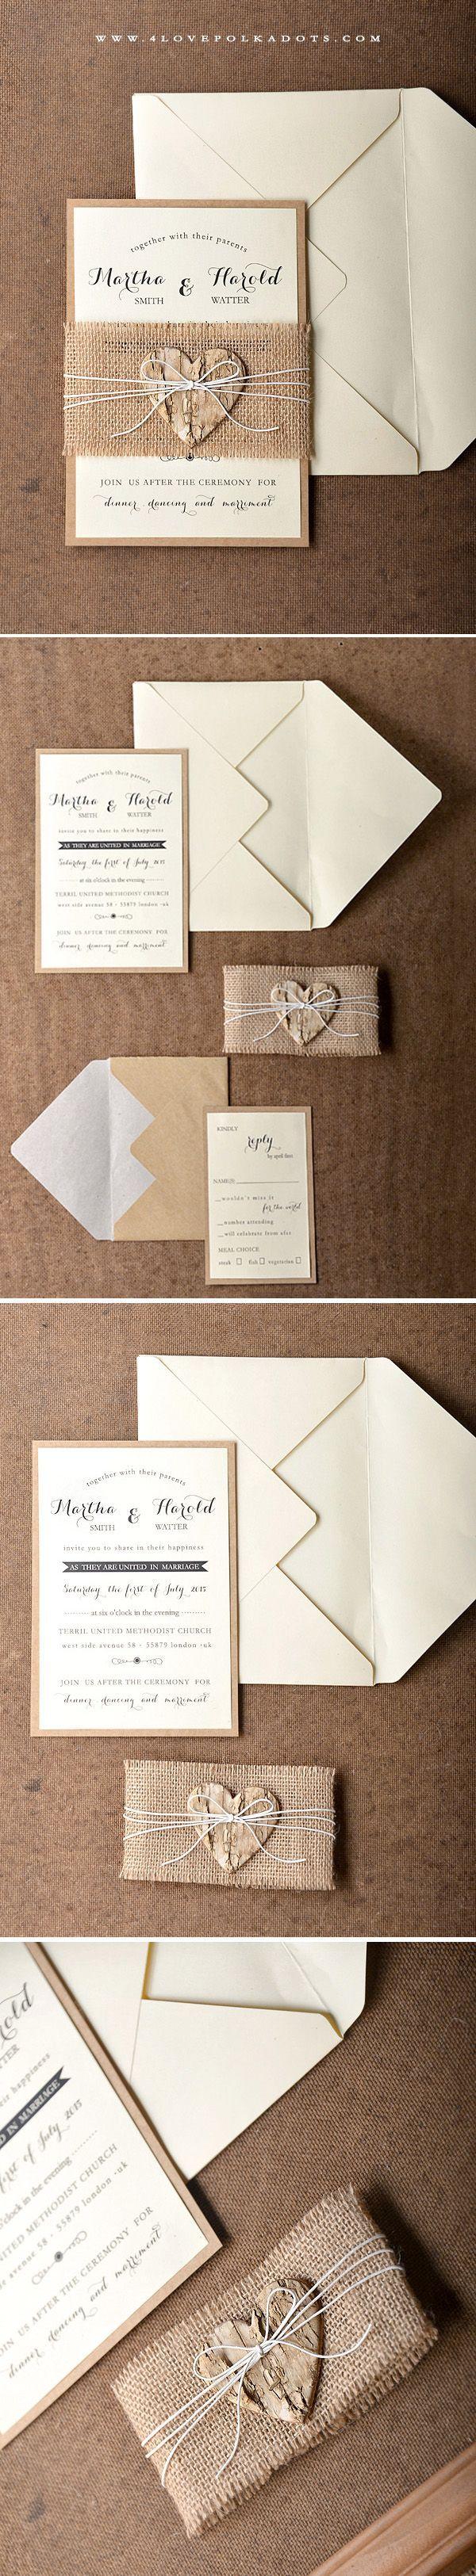 Wallpaper hd unique diy wedding invitations of gifts desktop best cards invites